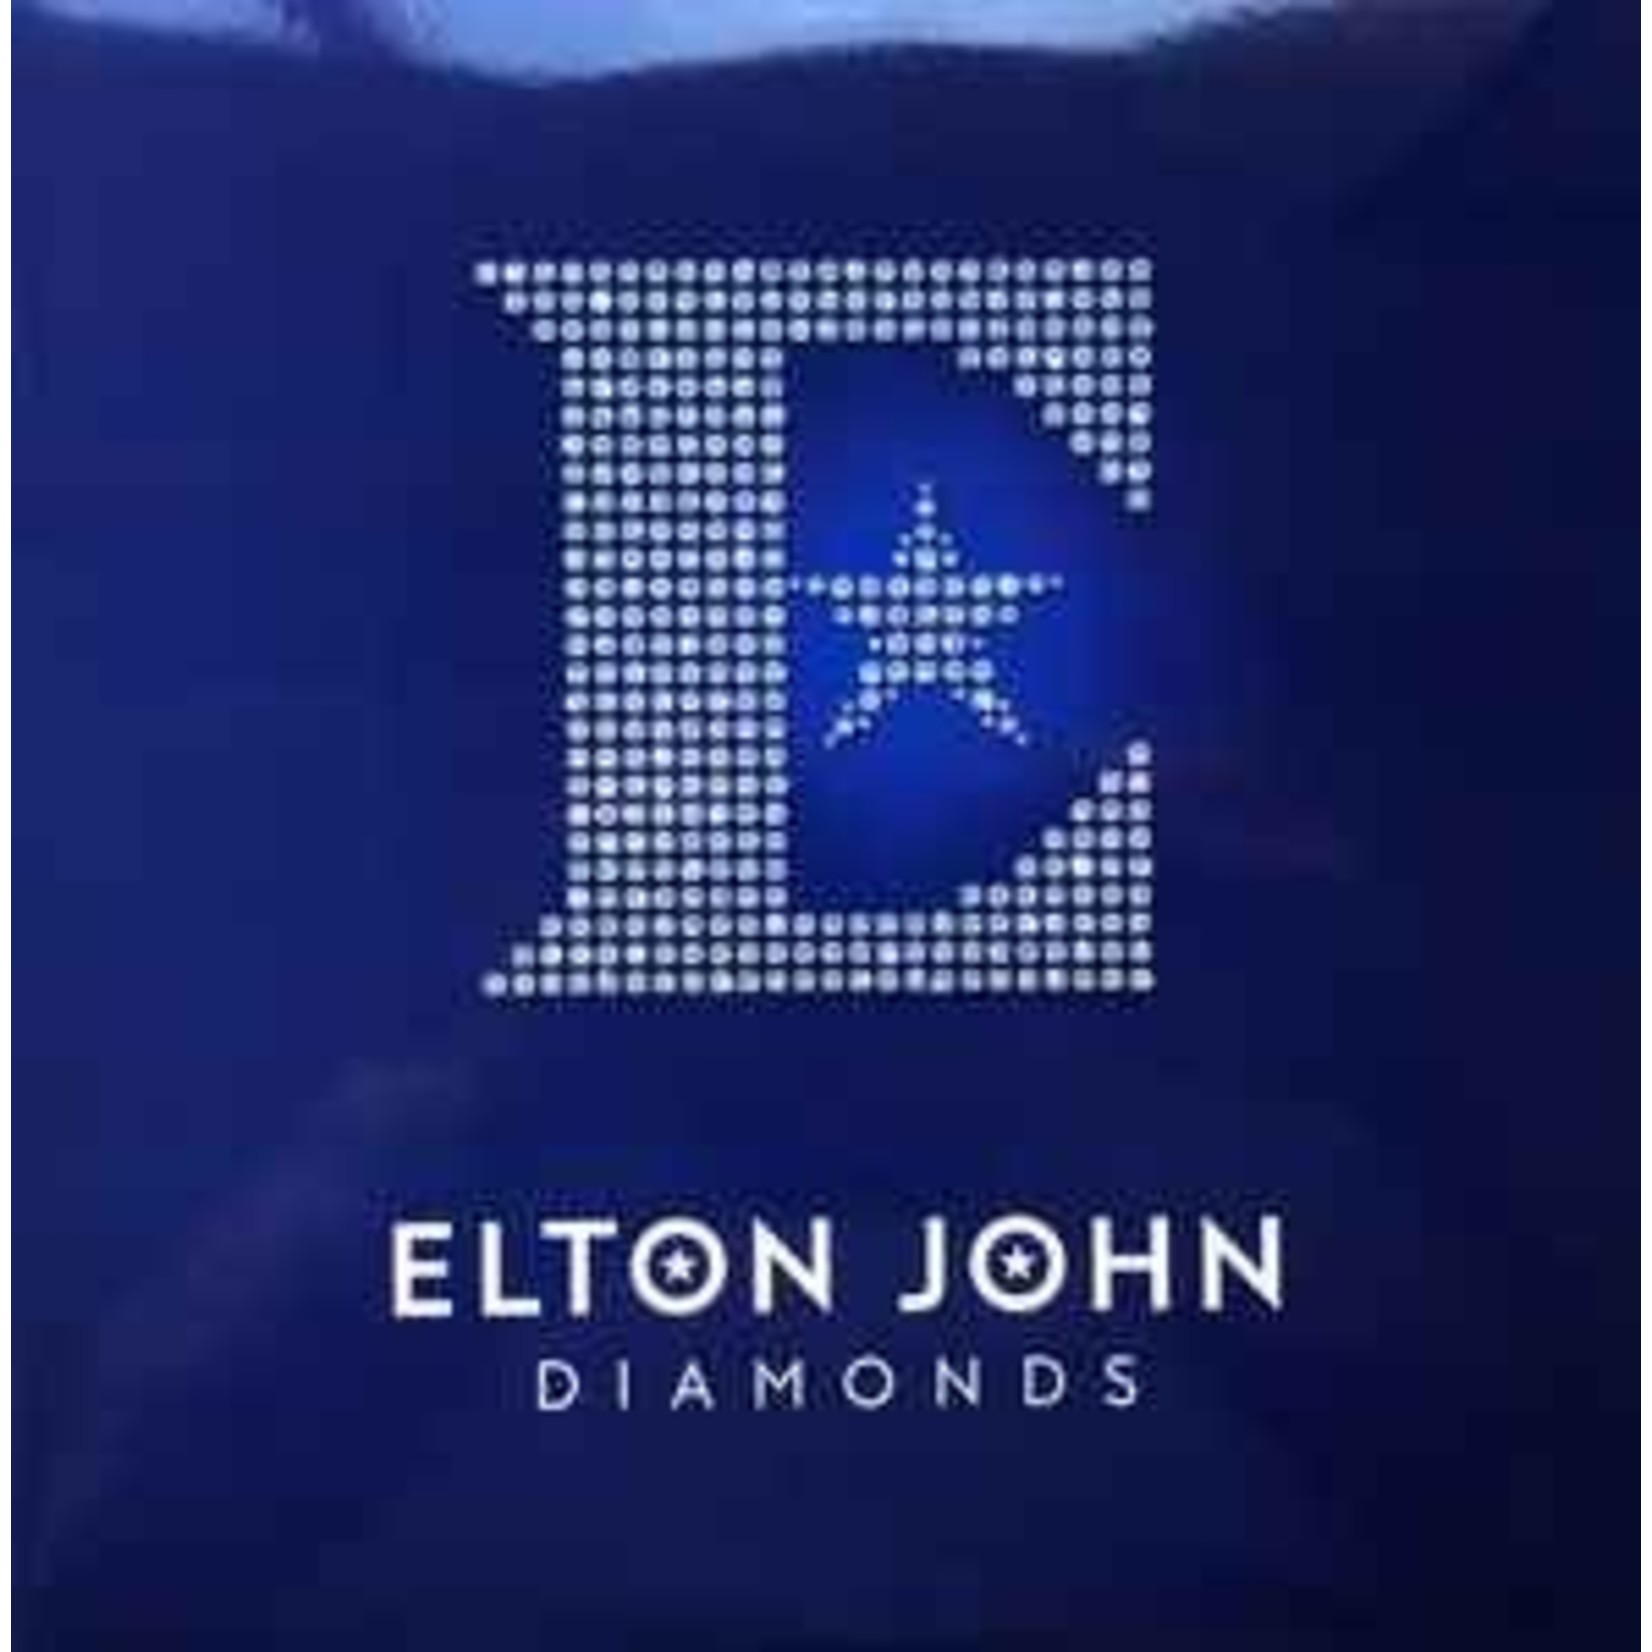 ELTON JOHN DIAMONDS  LIMITED EDITION 2LP  BLUE VINYL